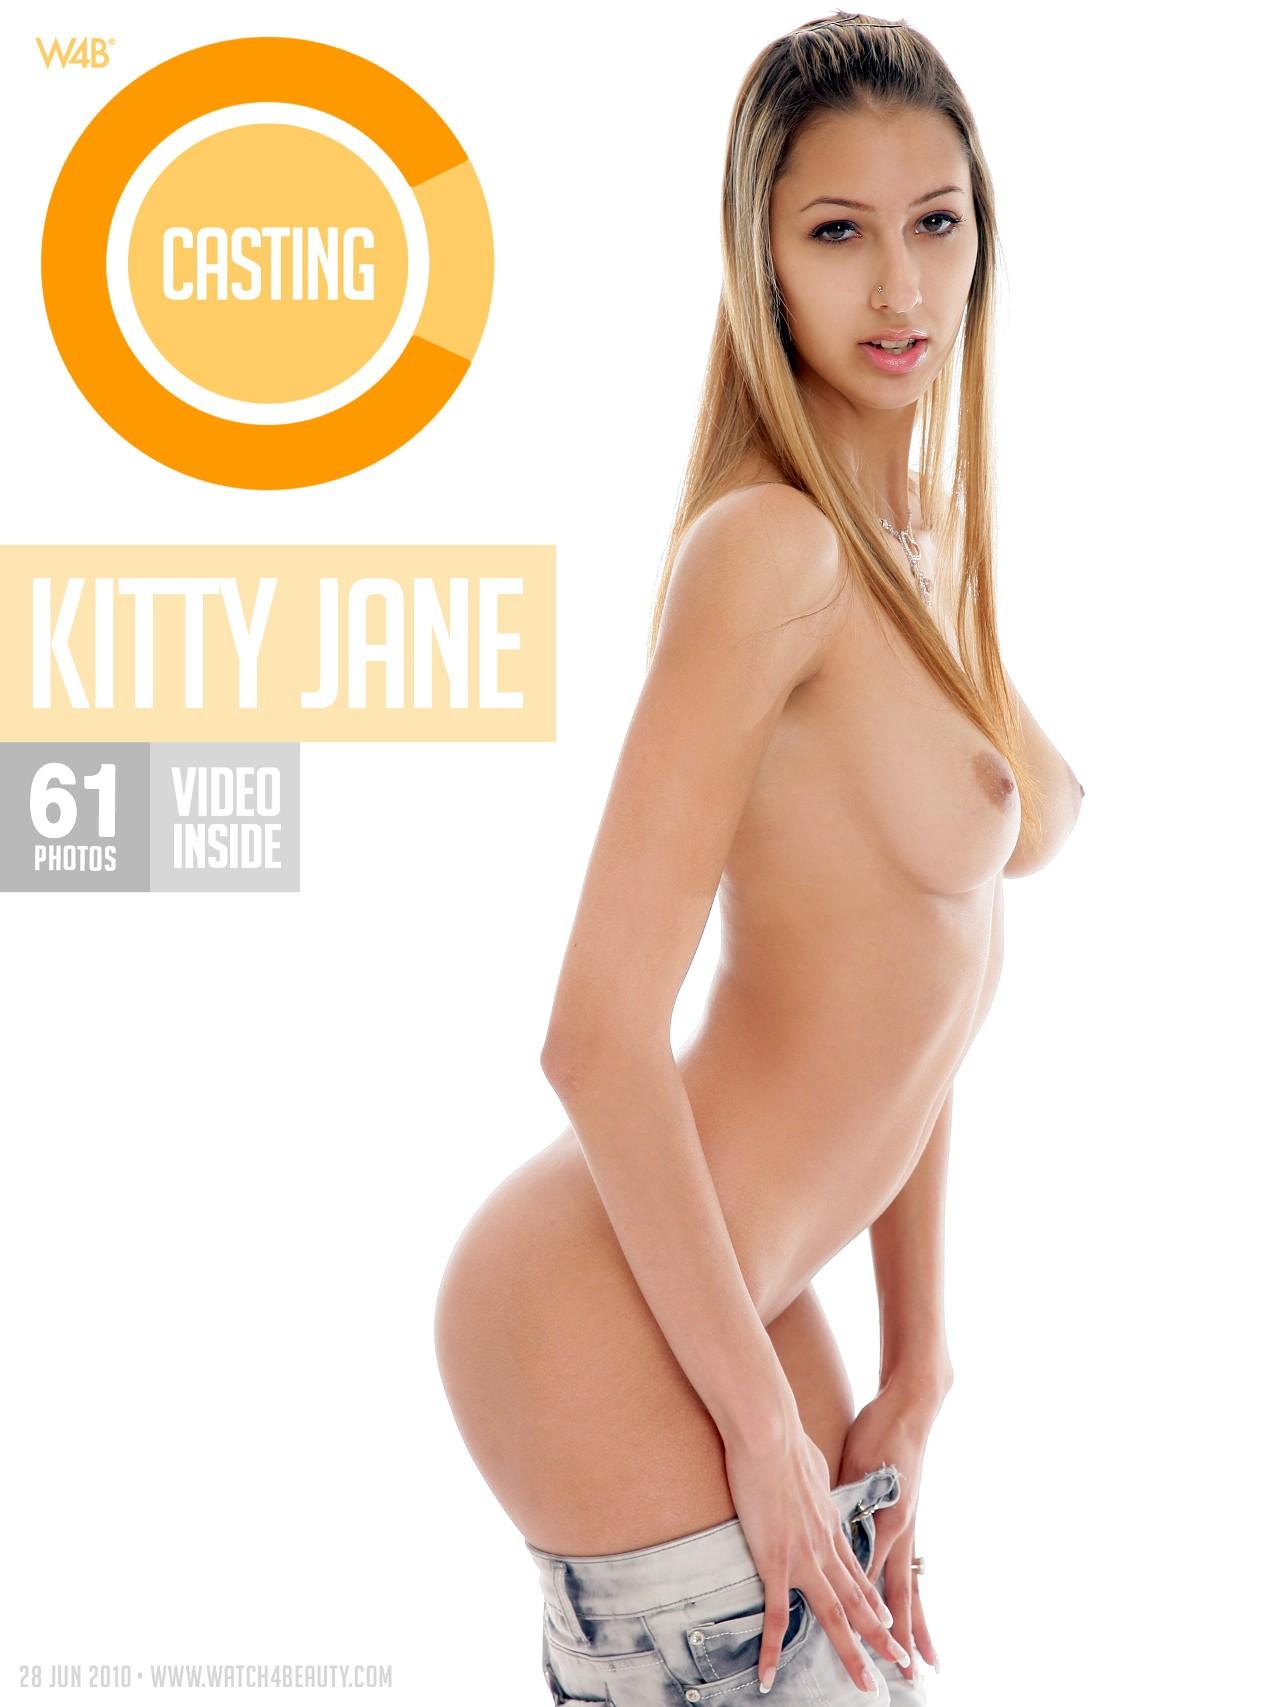 Kitty Jane: CASTING Kitty Jane